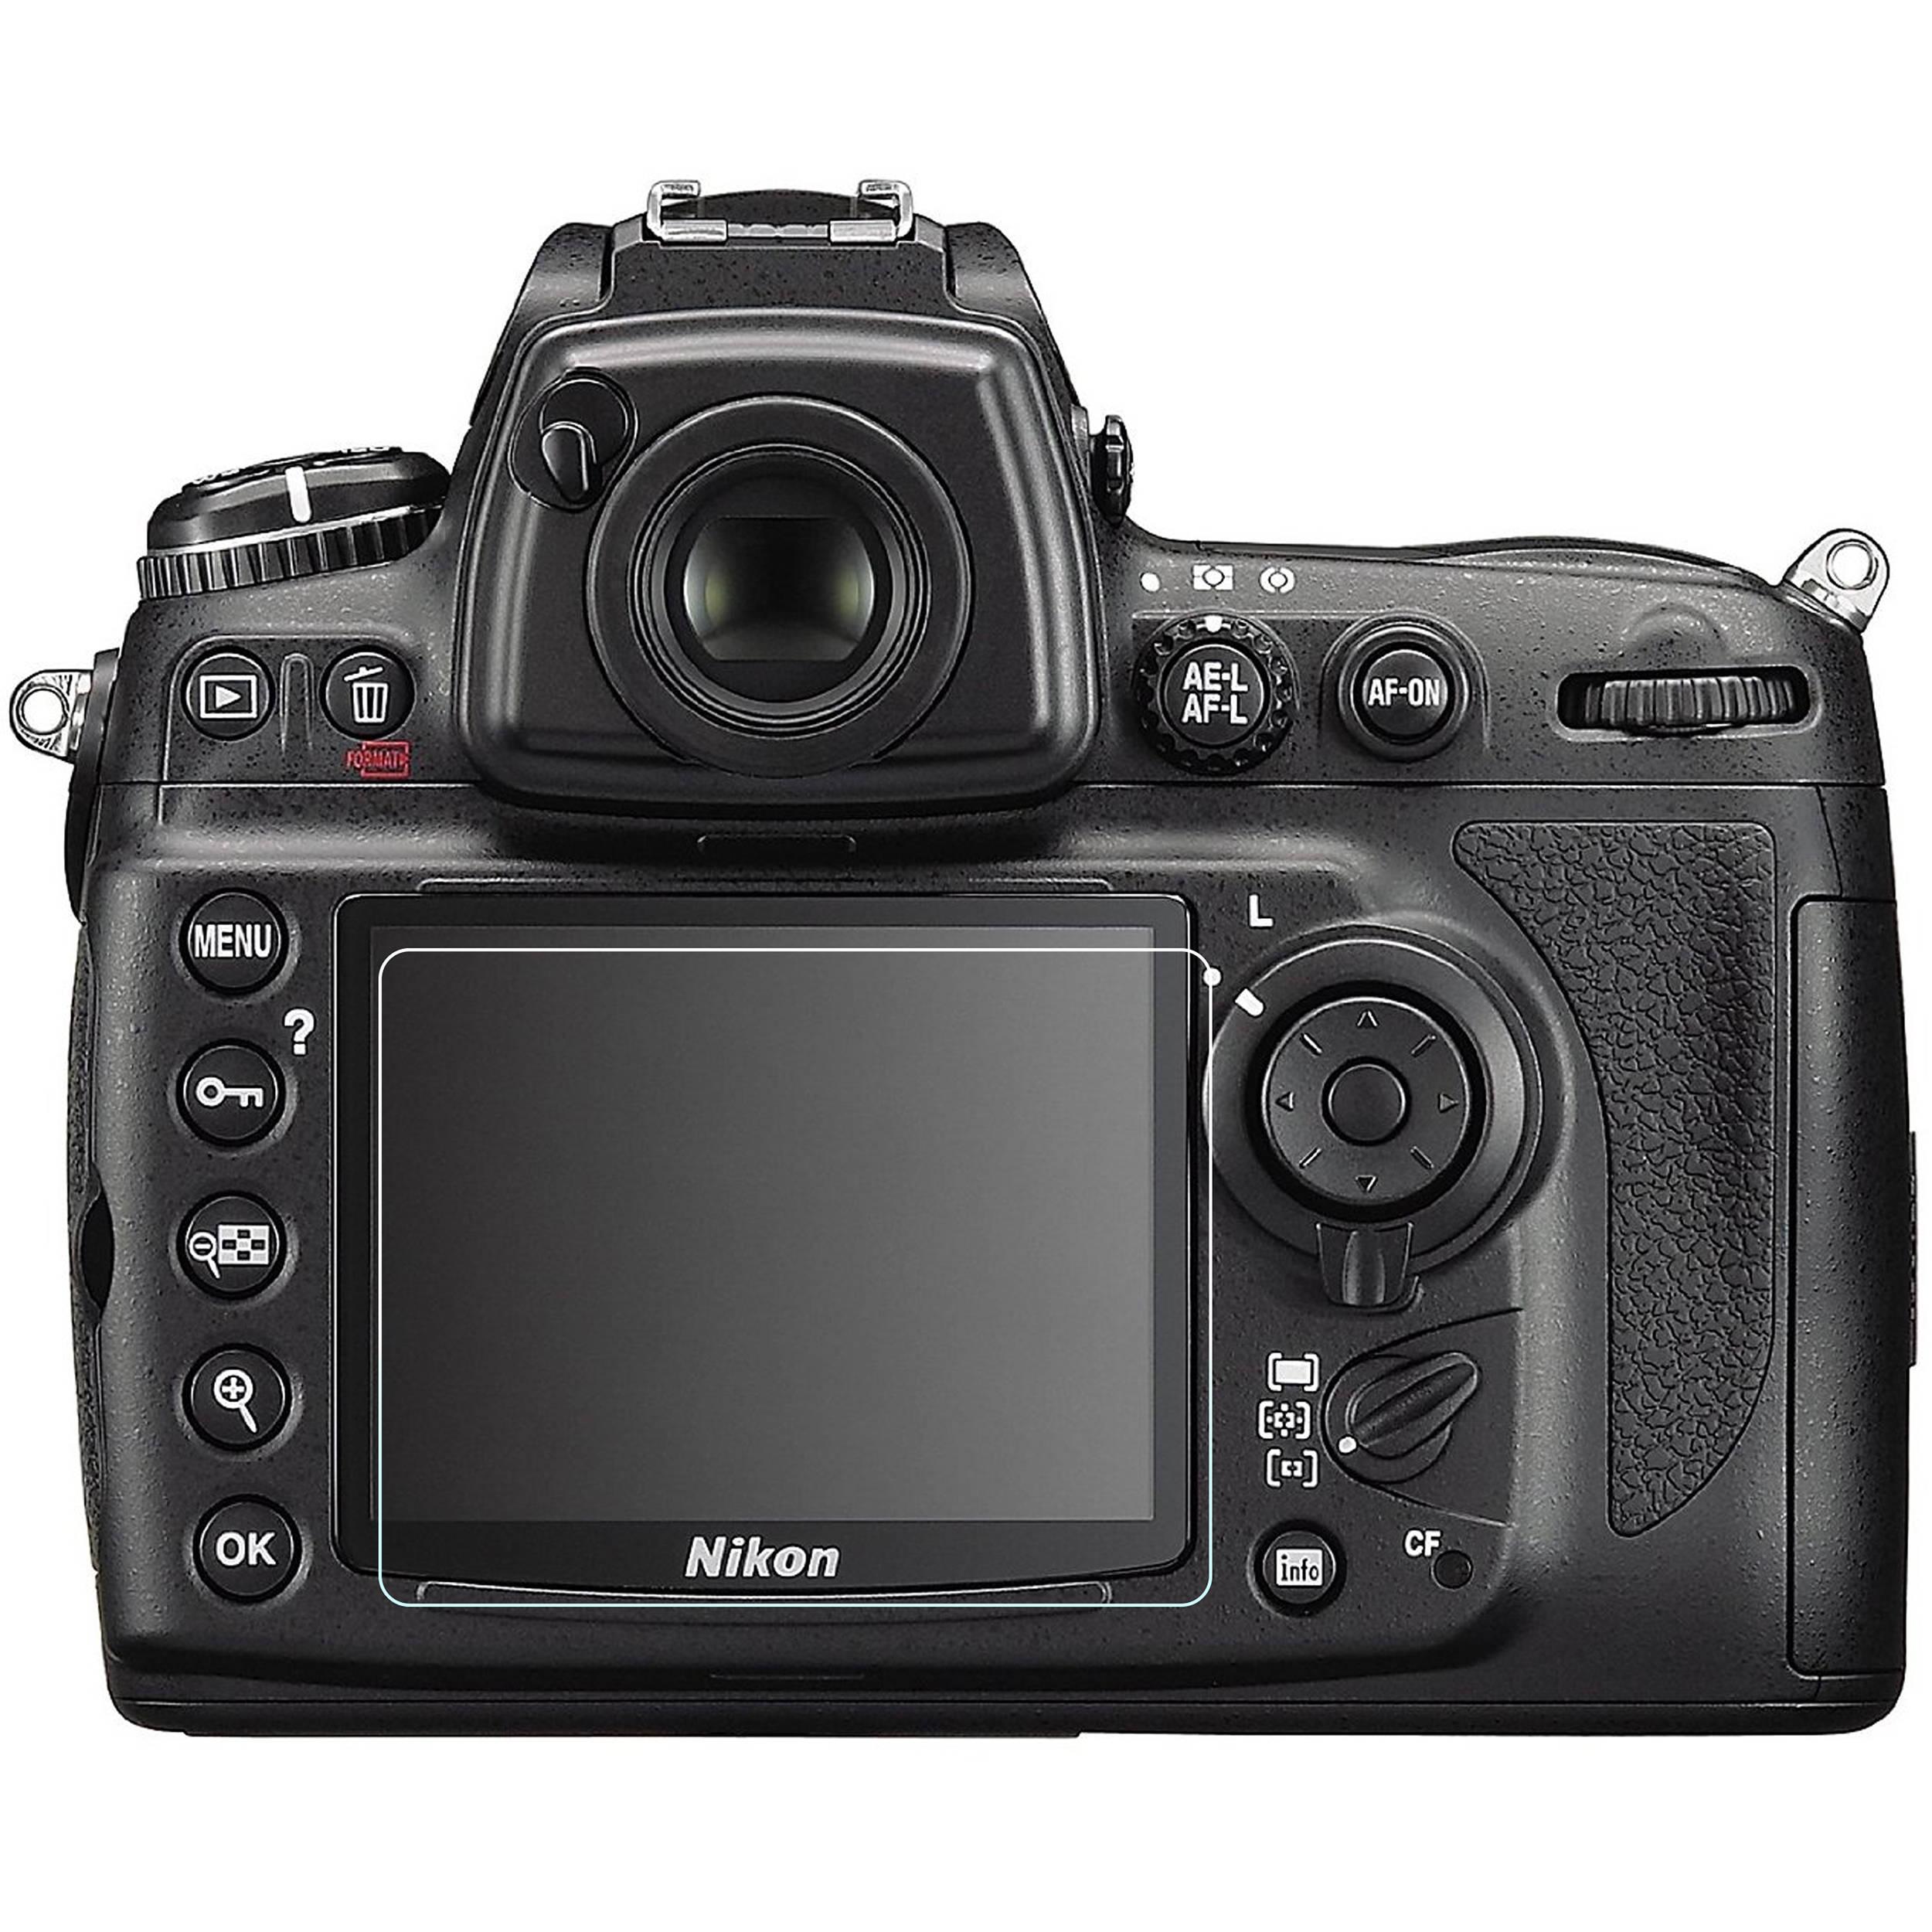 Nikon d7000 bh photo video phantom glass lcd screen protector for nikon d700 or d7000 baditri Images